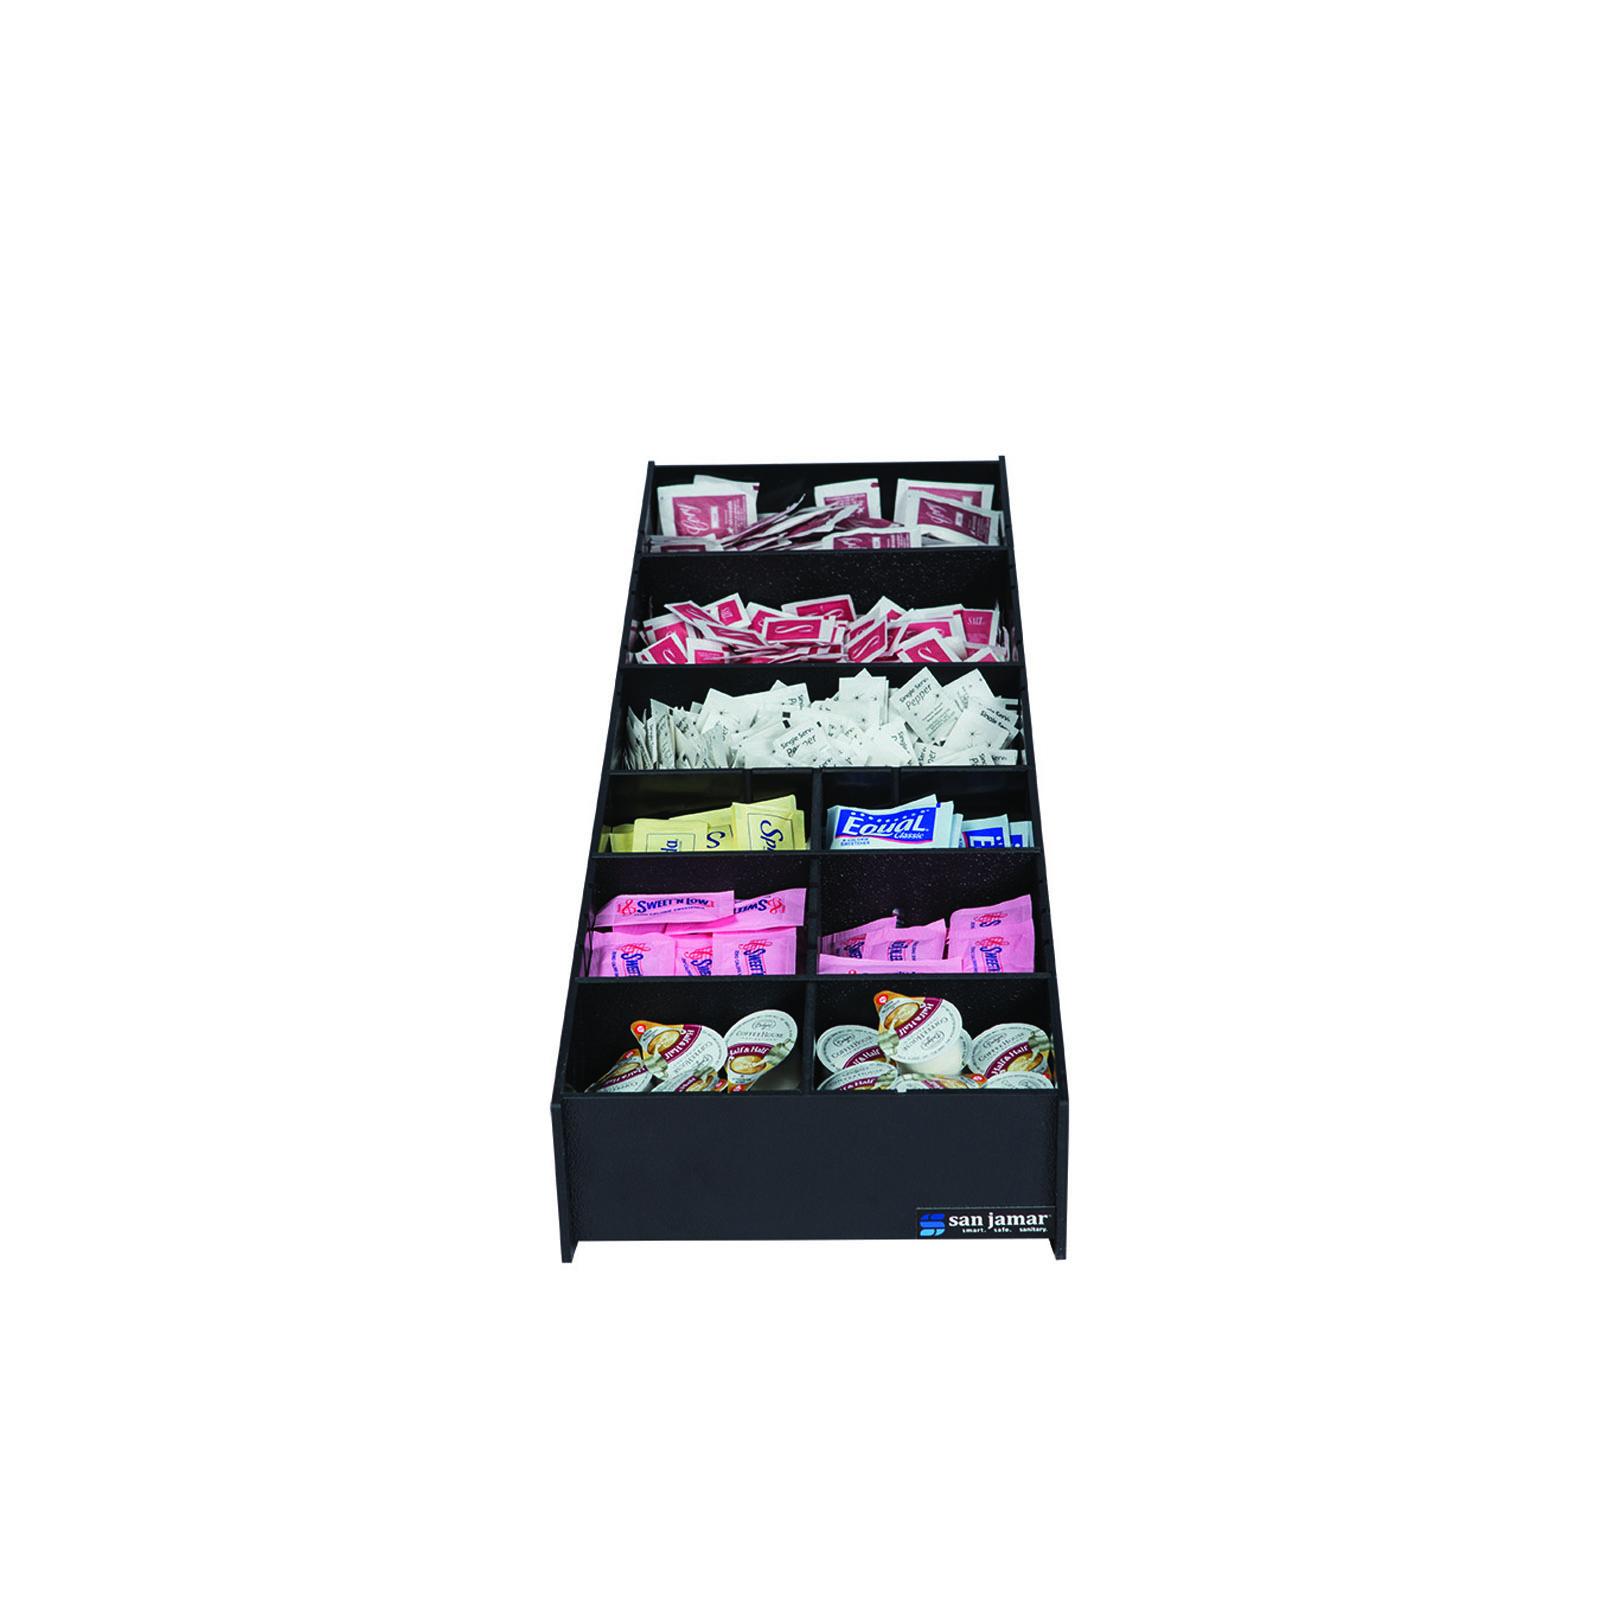 San Jamar L2900 condiment caddy, countertop organizer